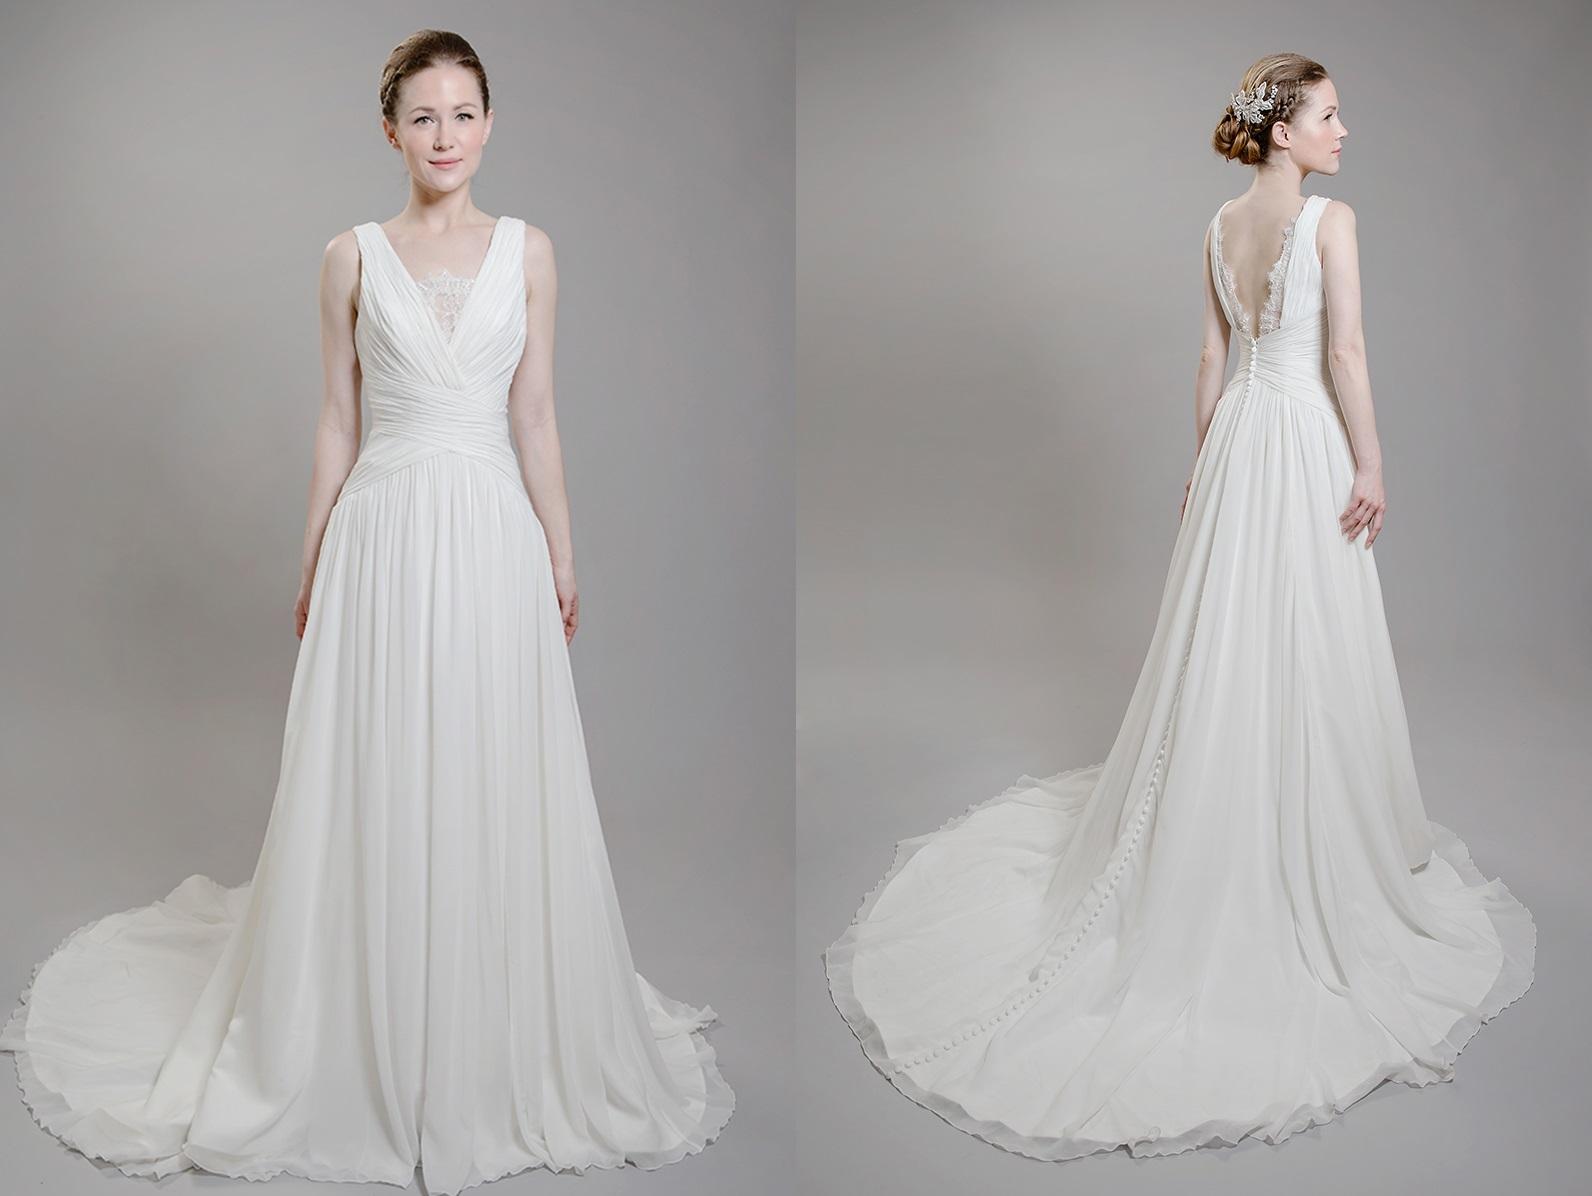 weddinggown3